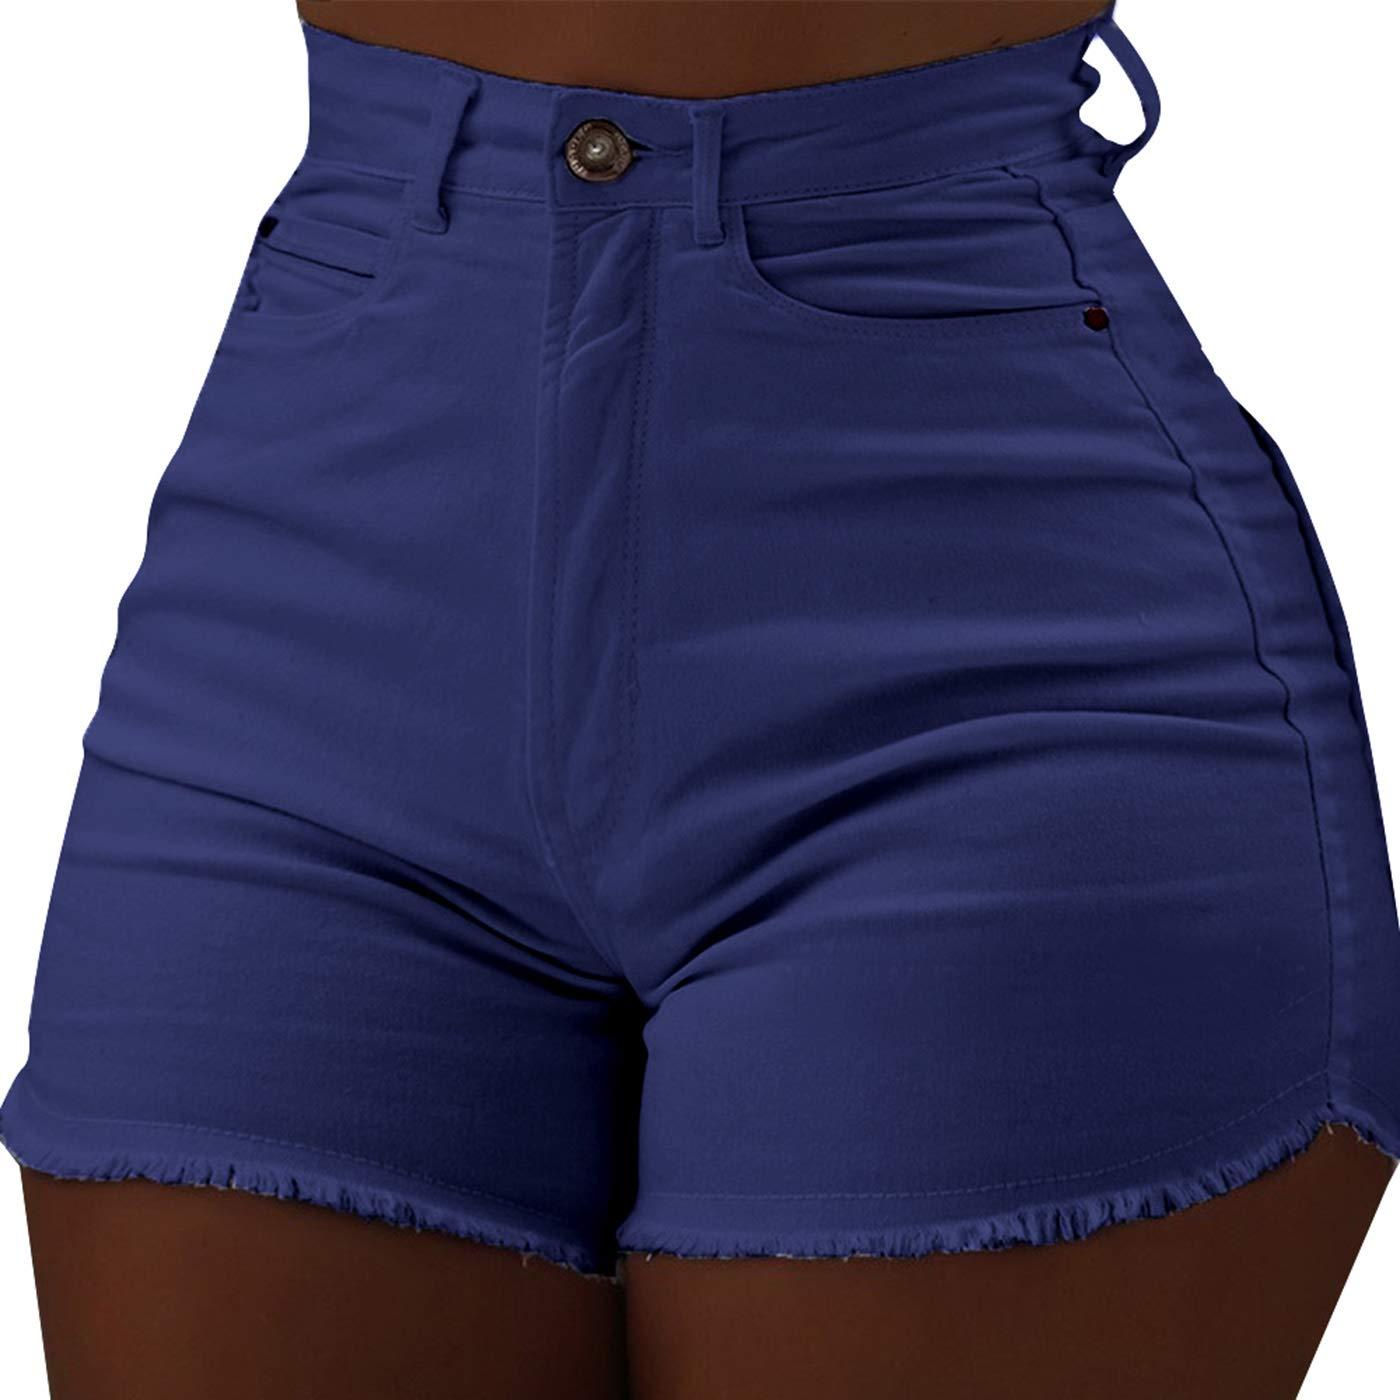 Vintage Retro High Waist Frayed Raw Hem Body Enhancing Denim Shorts Jeans Denim Hot Shorts for Women